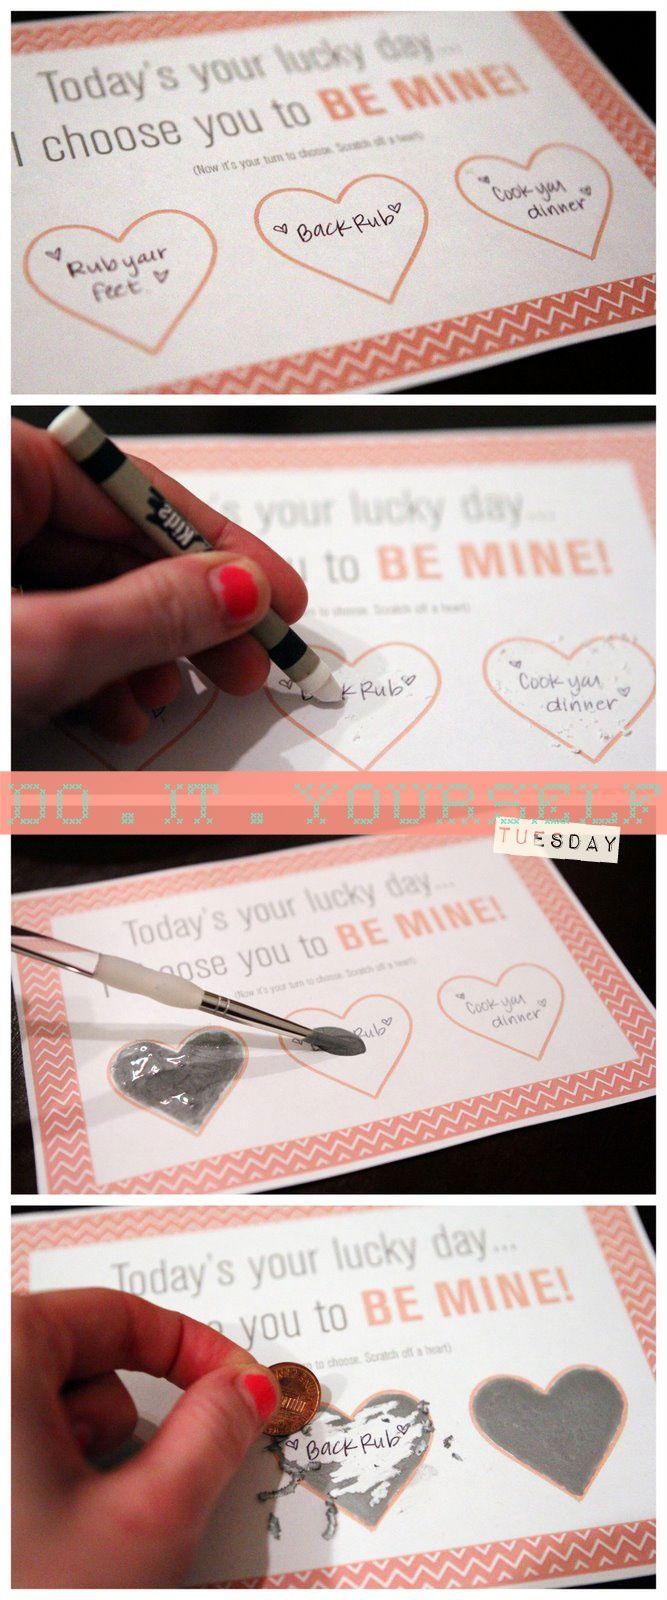 DIY scratcher, cute idea! Make it for a date night or special reward. 목공용 풀 과 물감 1대1 그리고 그전에 양초러 칠하기